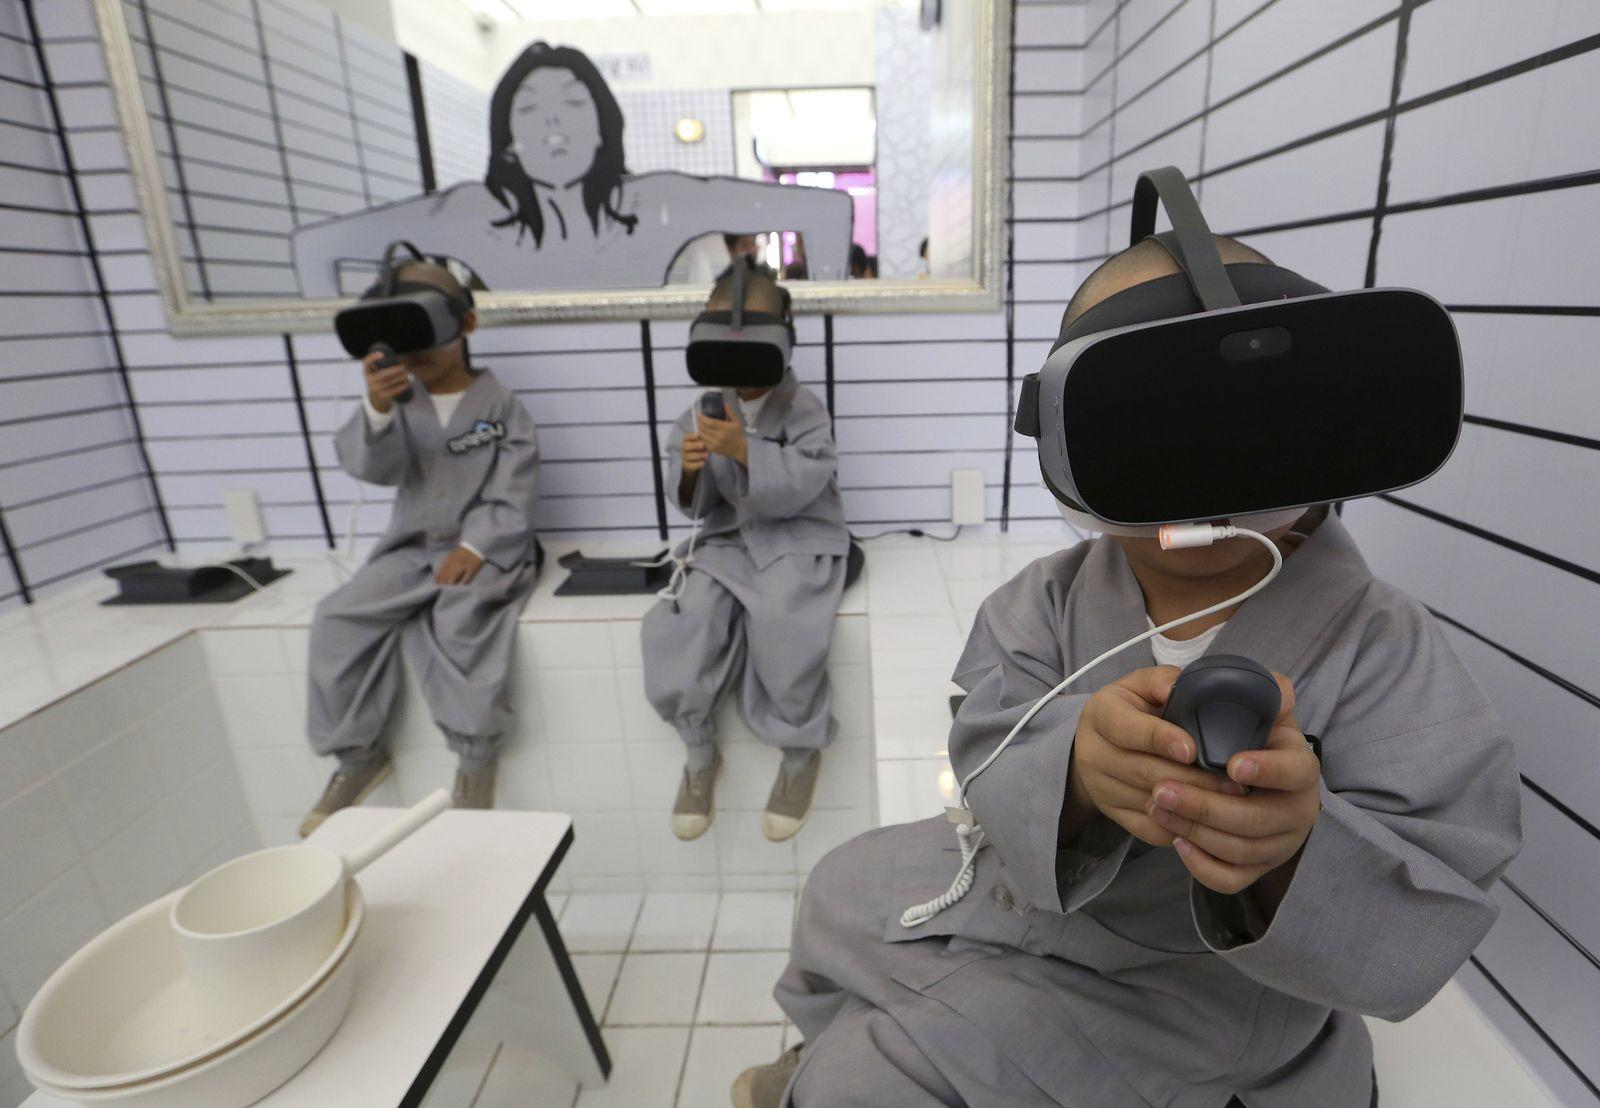 Trends/ Netzwelt/ Virtual Reality